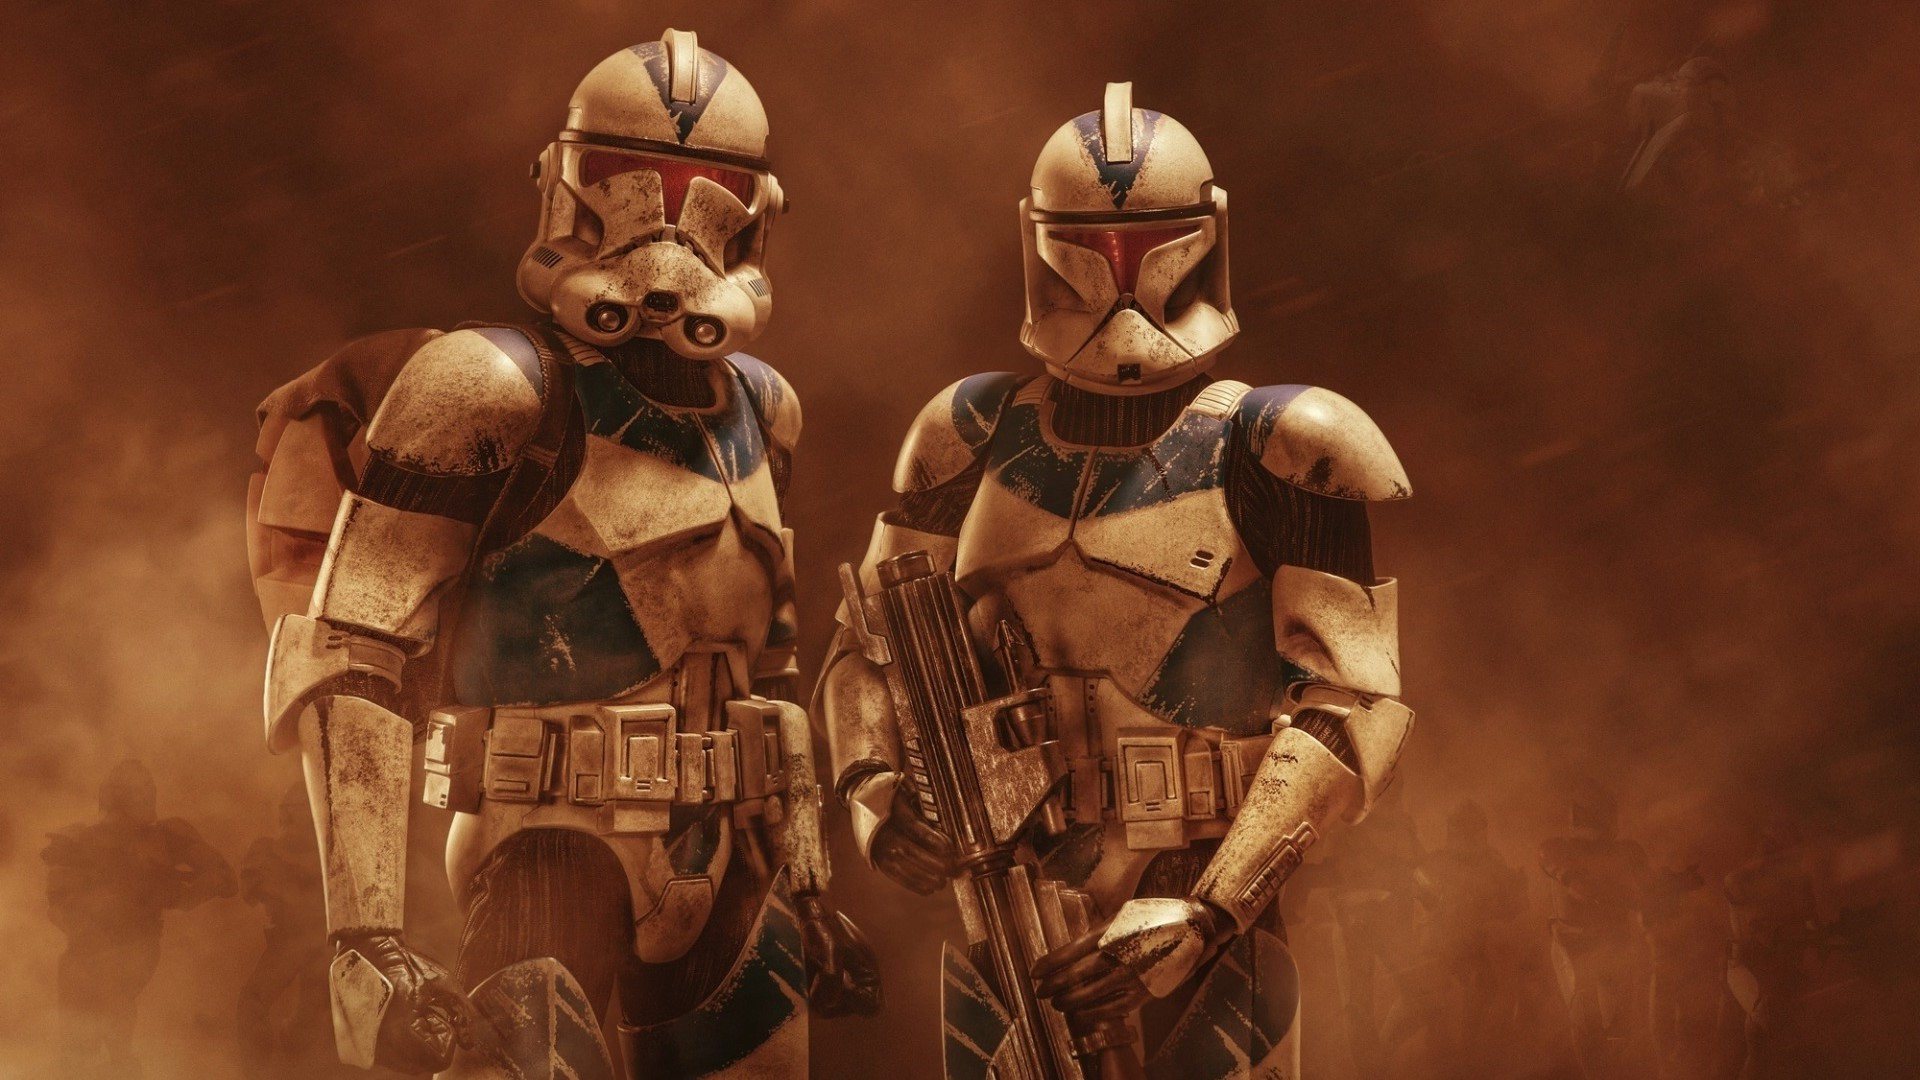 Star Wars Clone Troopers Wallpaper Src Star Wars Star Wars Clones Artwork 1920x1080 Download Hd Wallpaper Wallpapertip